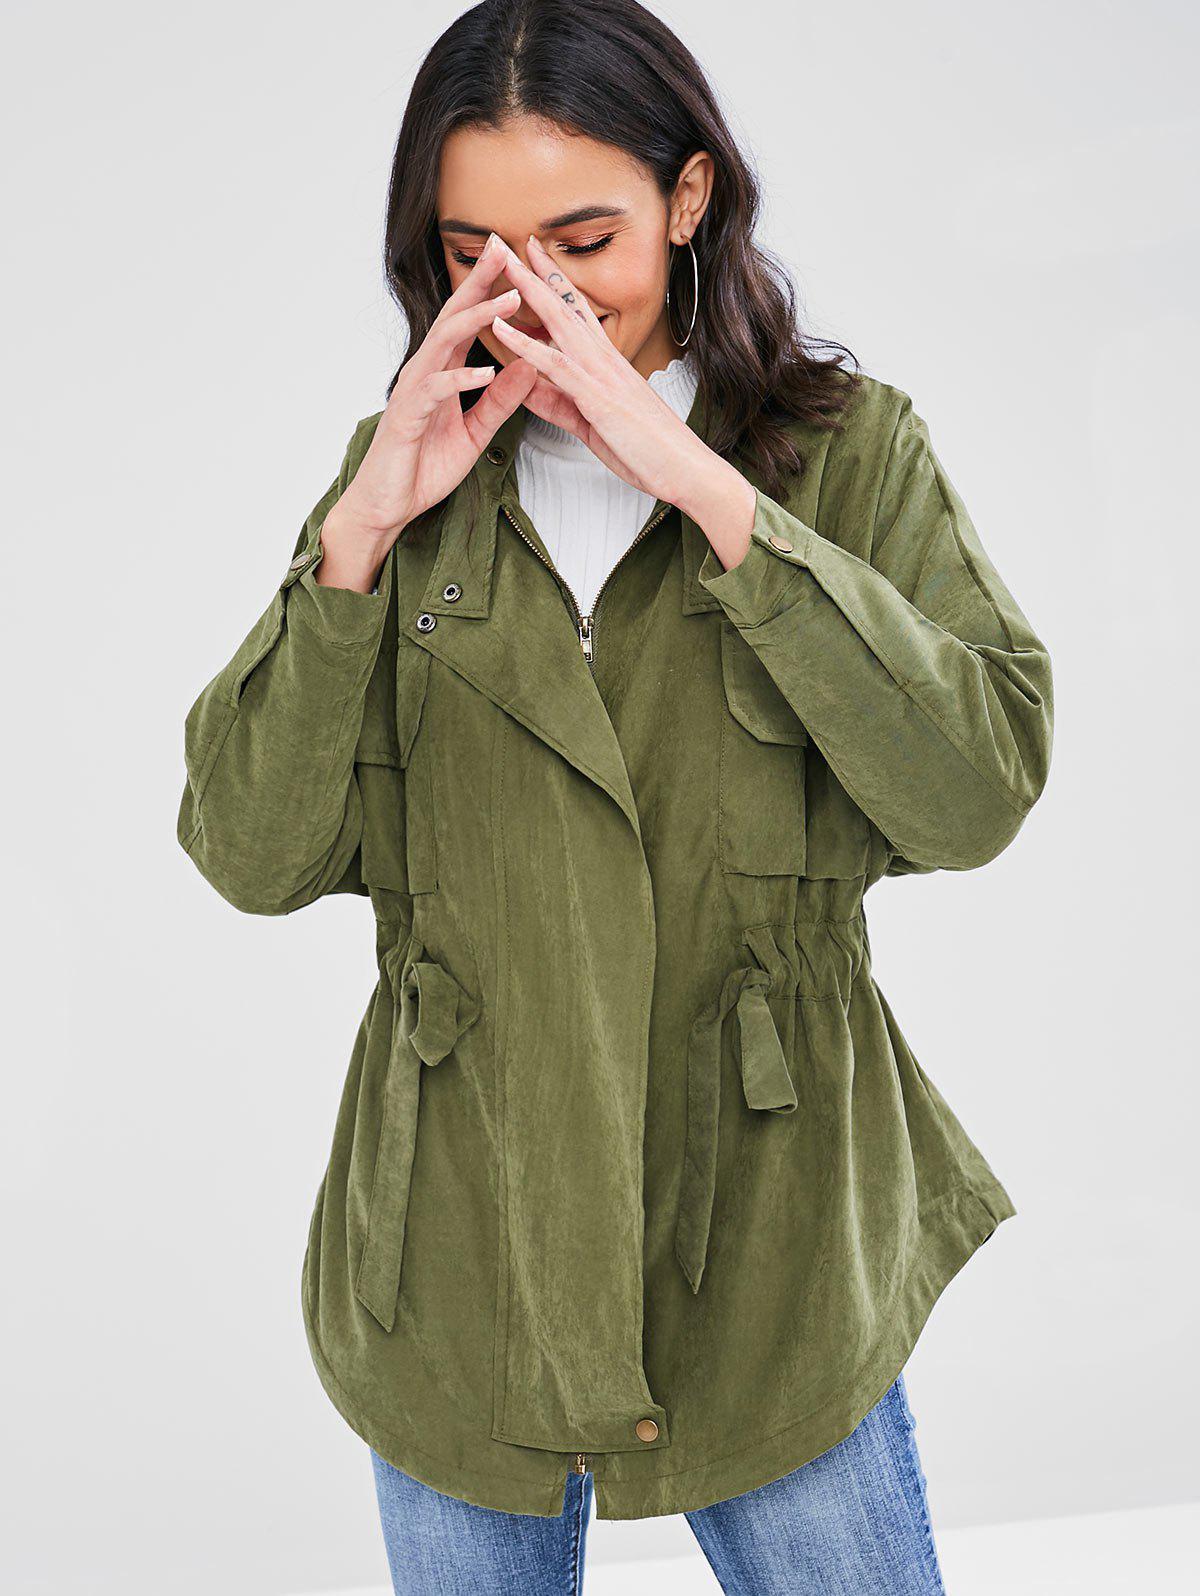 Flap Pockets Elastic Tie Waist Jacket, Army green